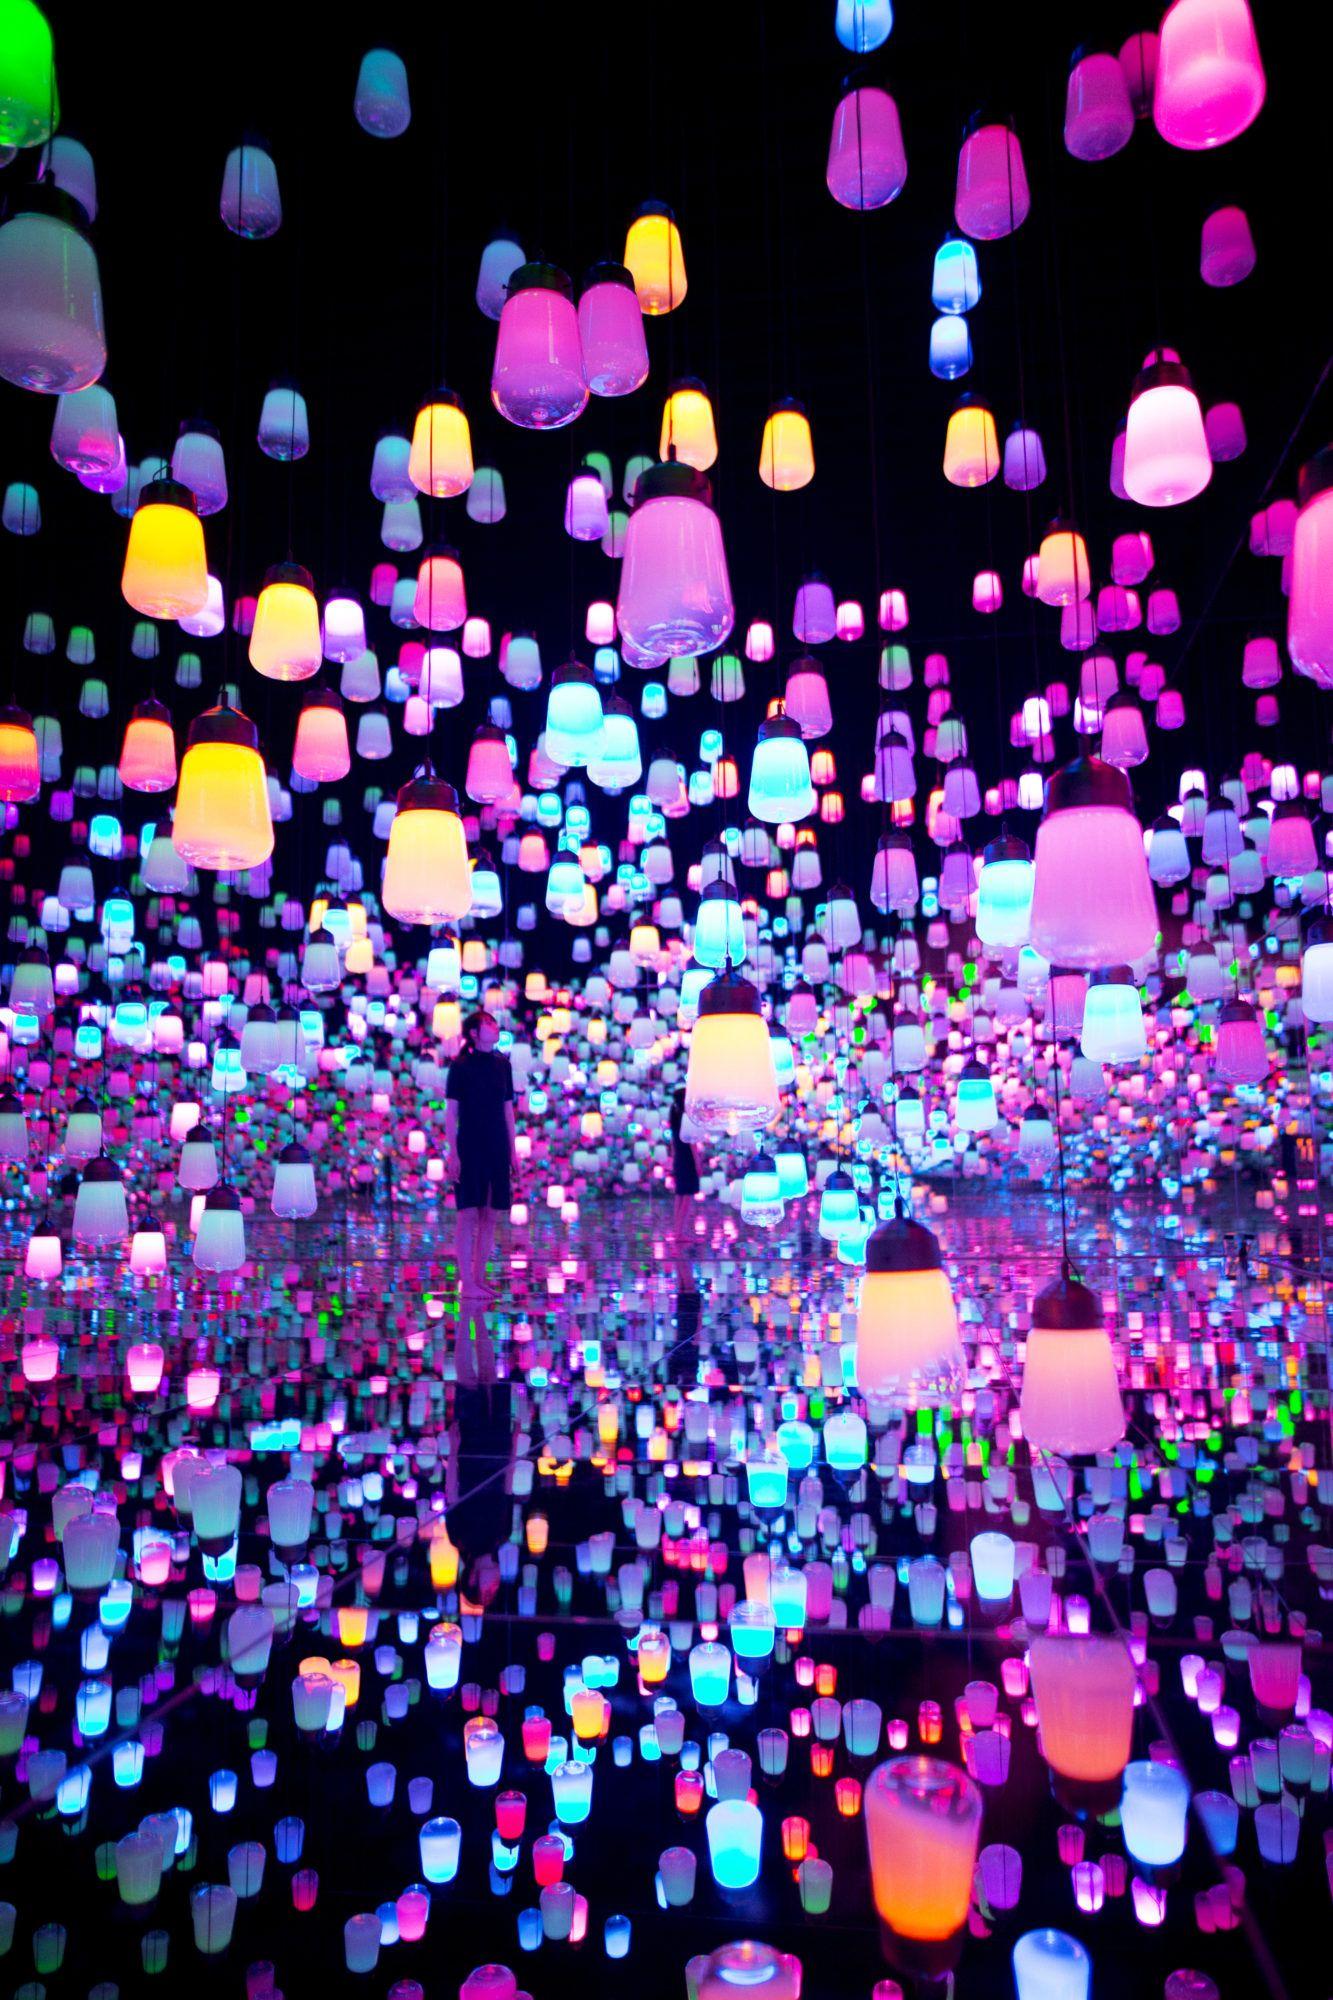 Life Styled By Stacy Garcia Teamlab S Borderless World In 2020 Tokyo Art Digital Art Design Tokyo Design